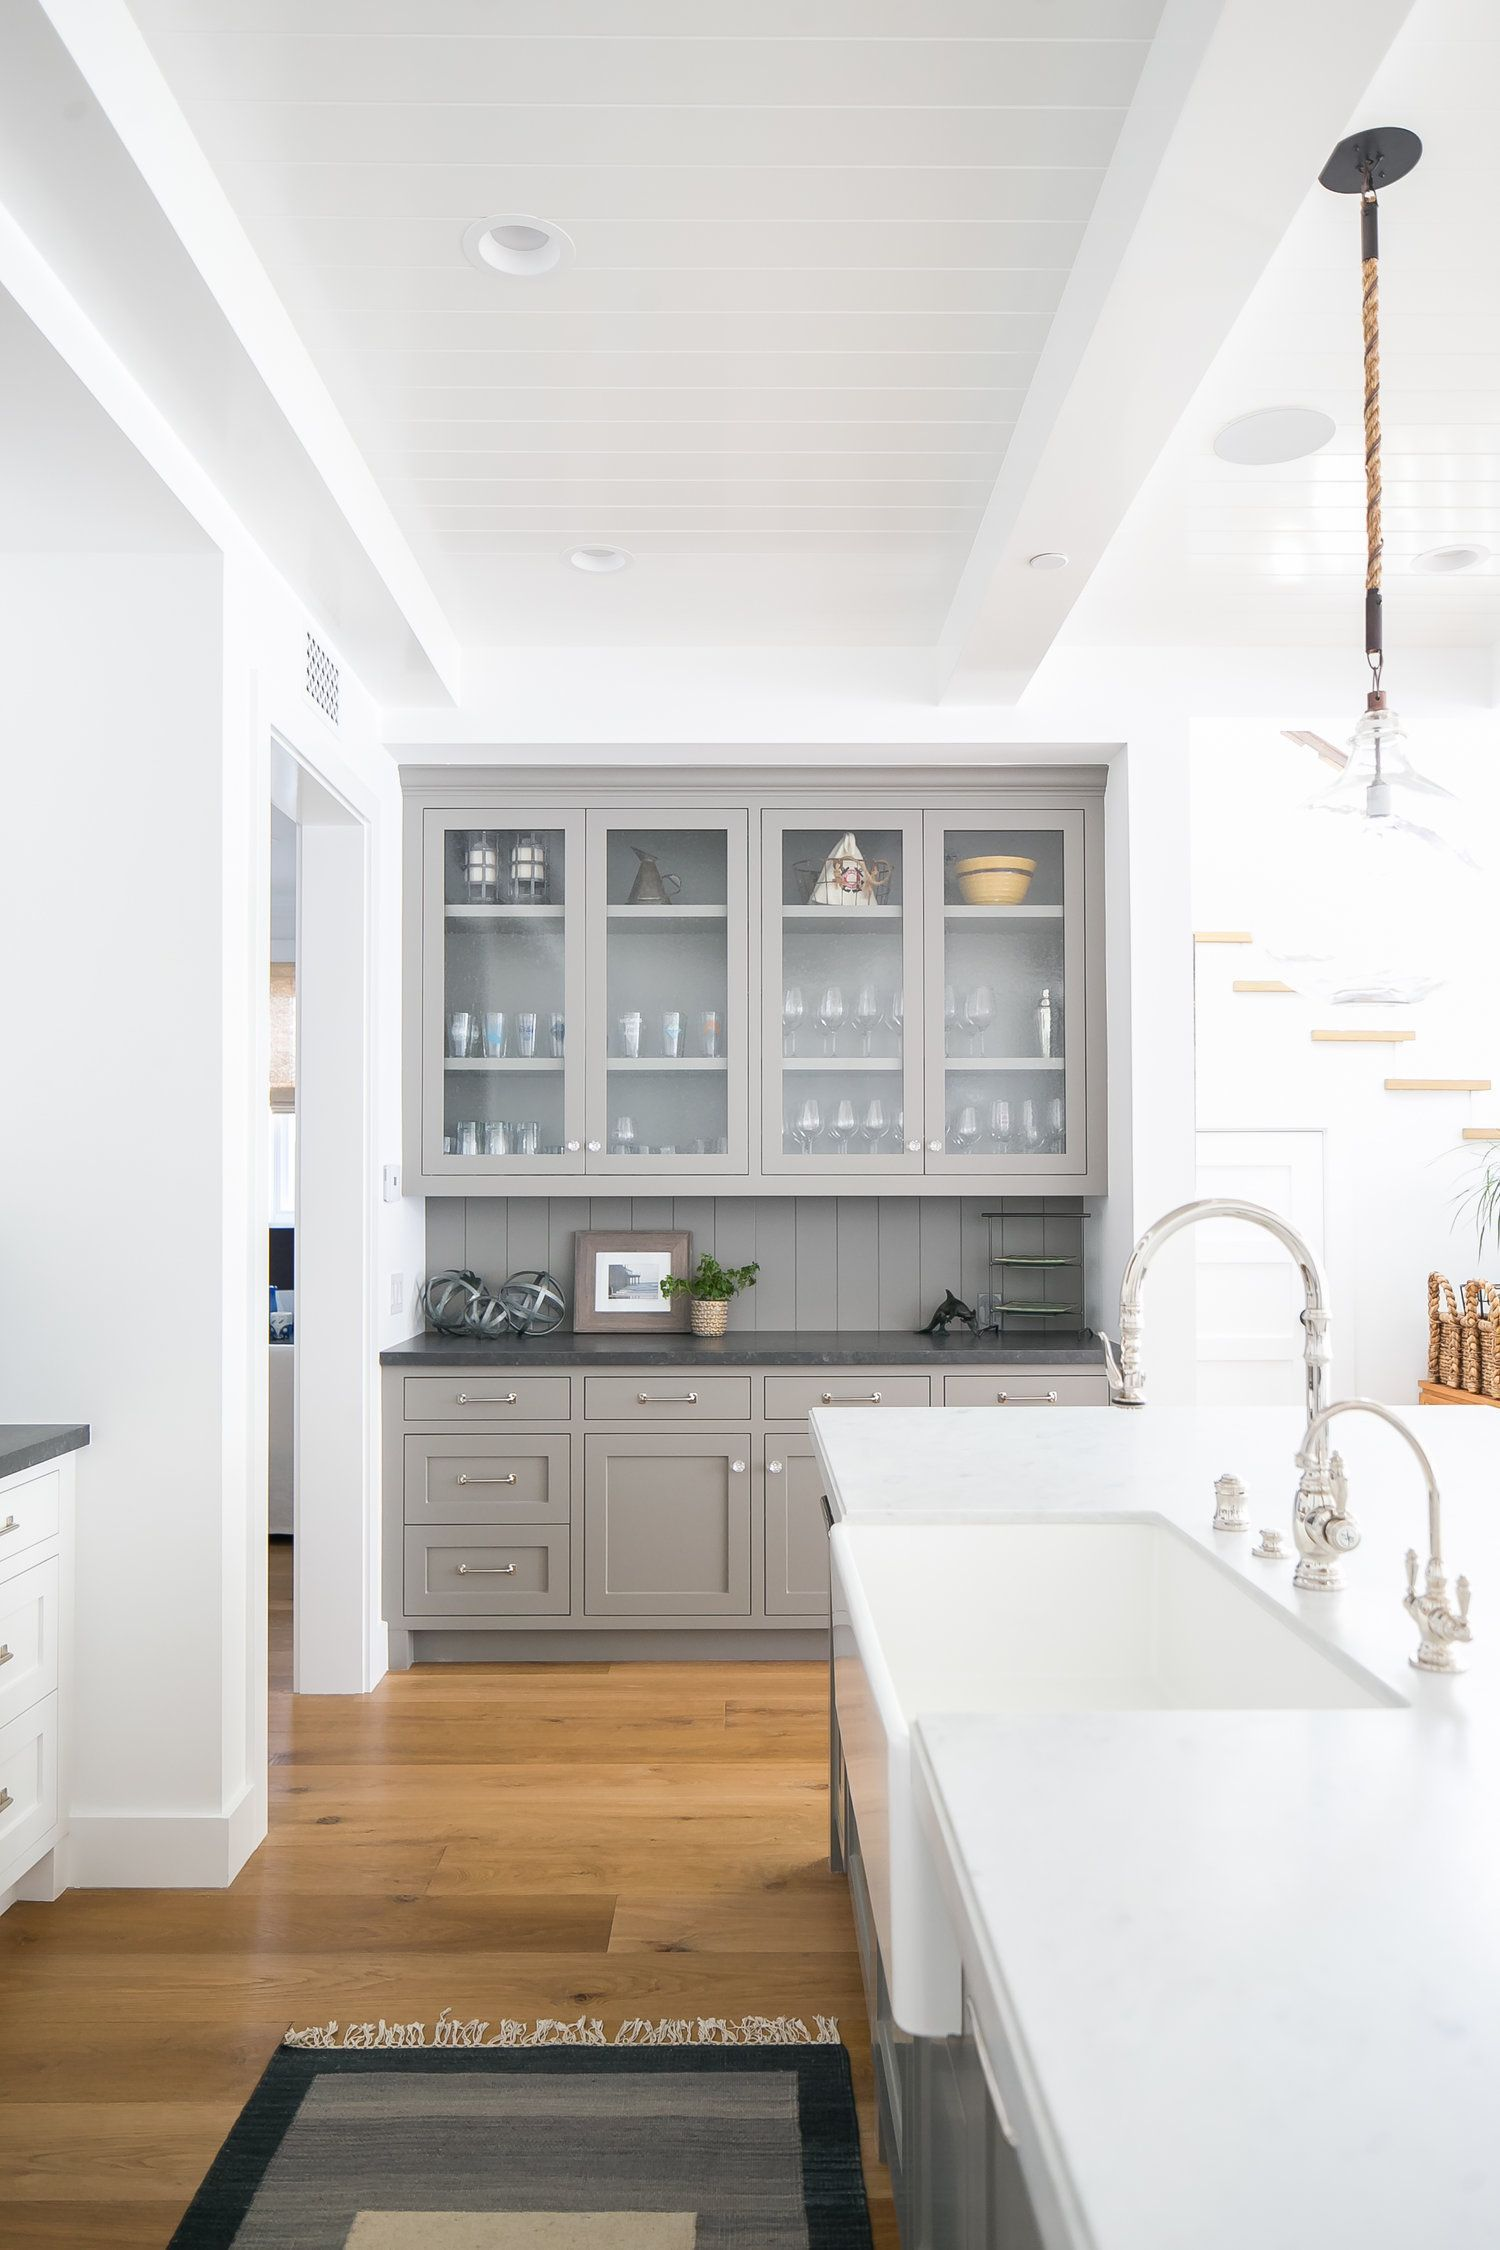 Gray cabinets in white kitchen inspiration board kitchen